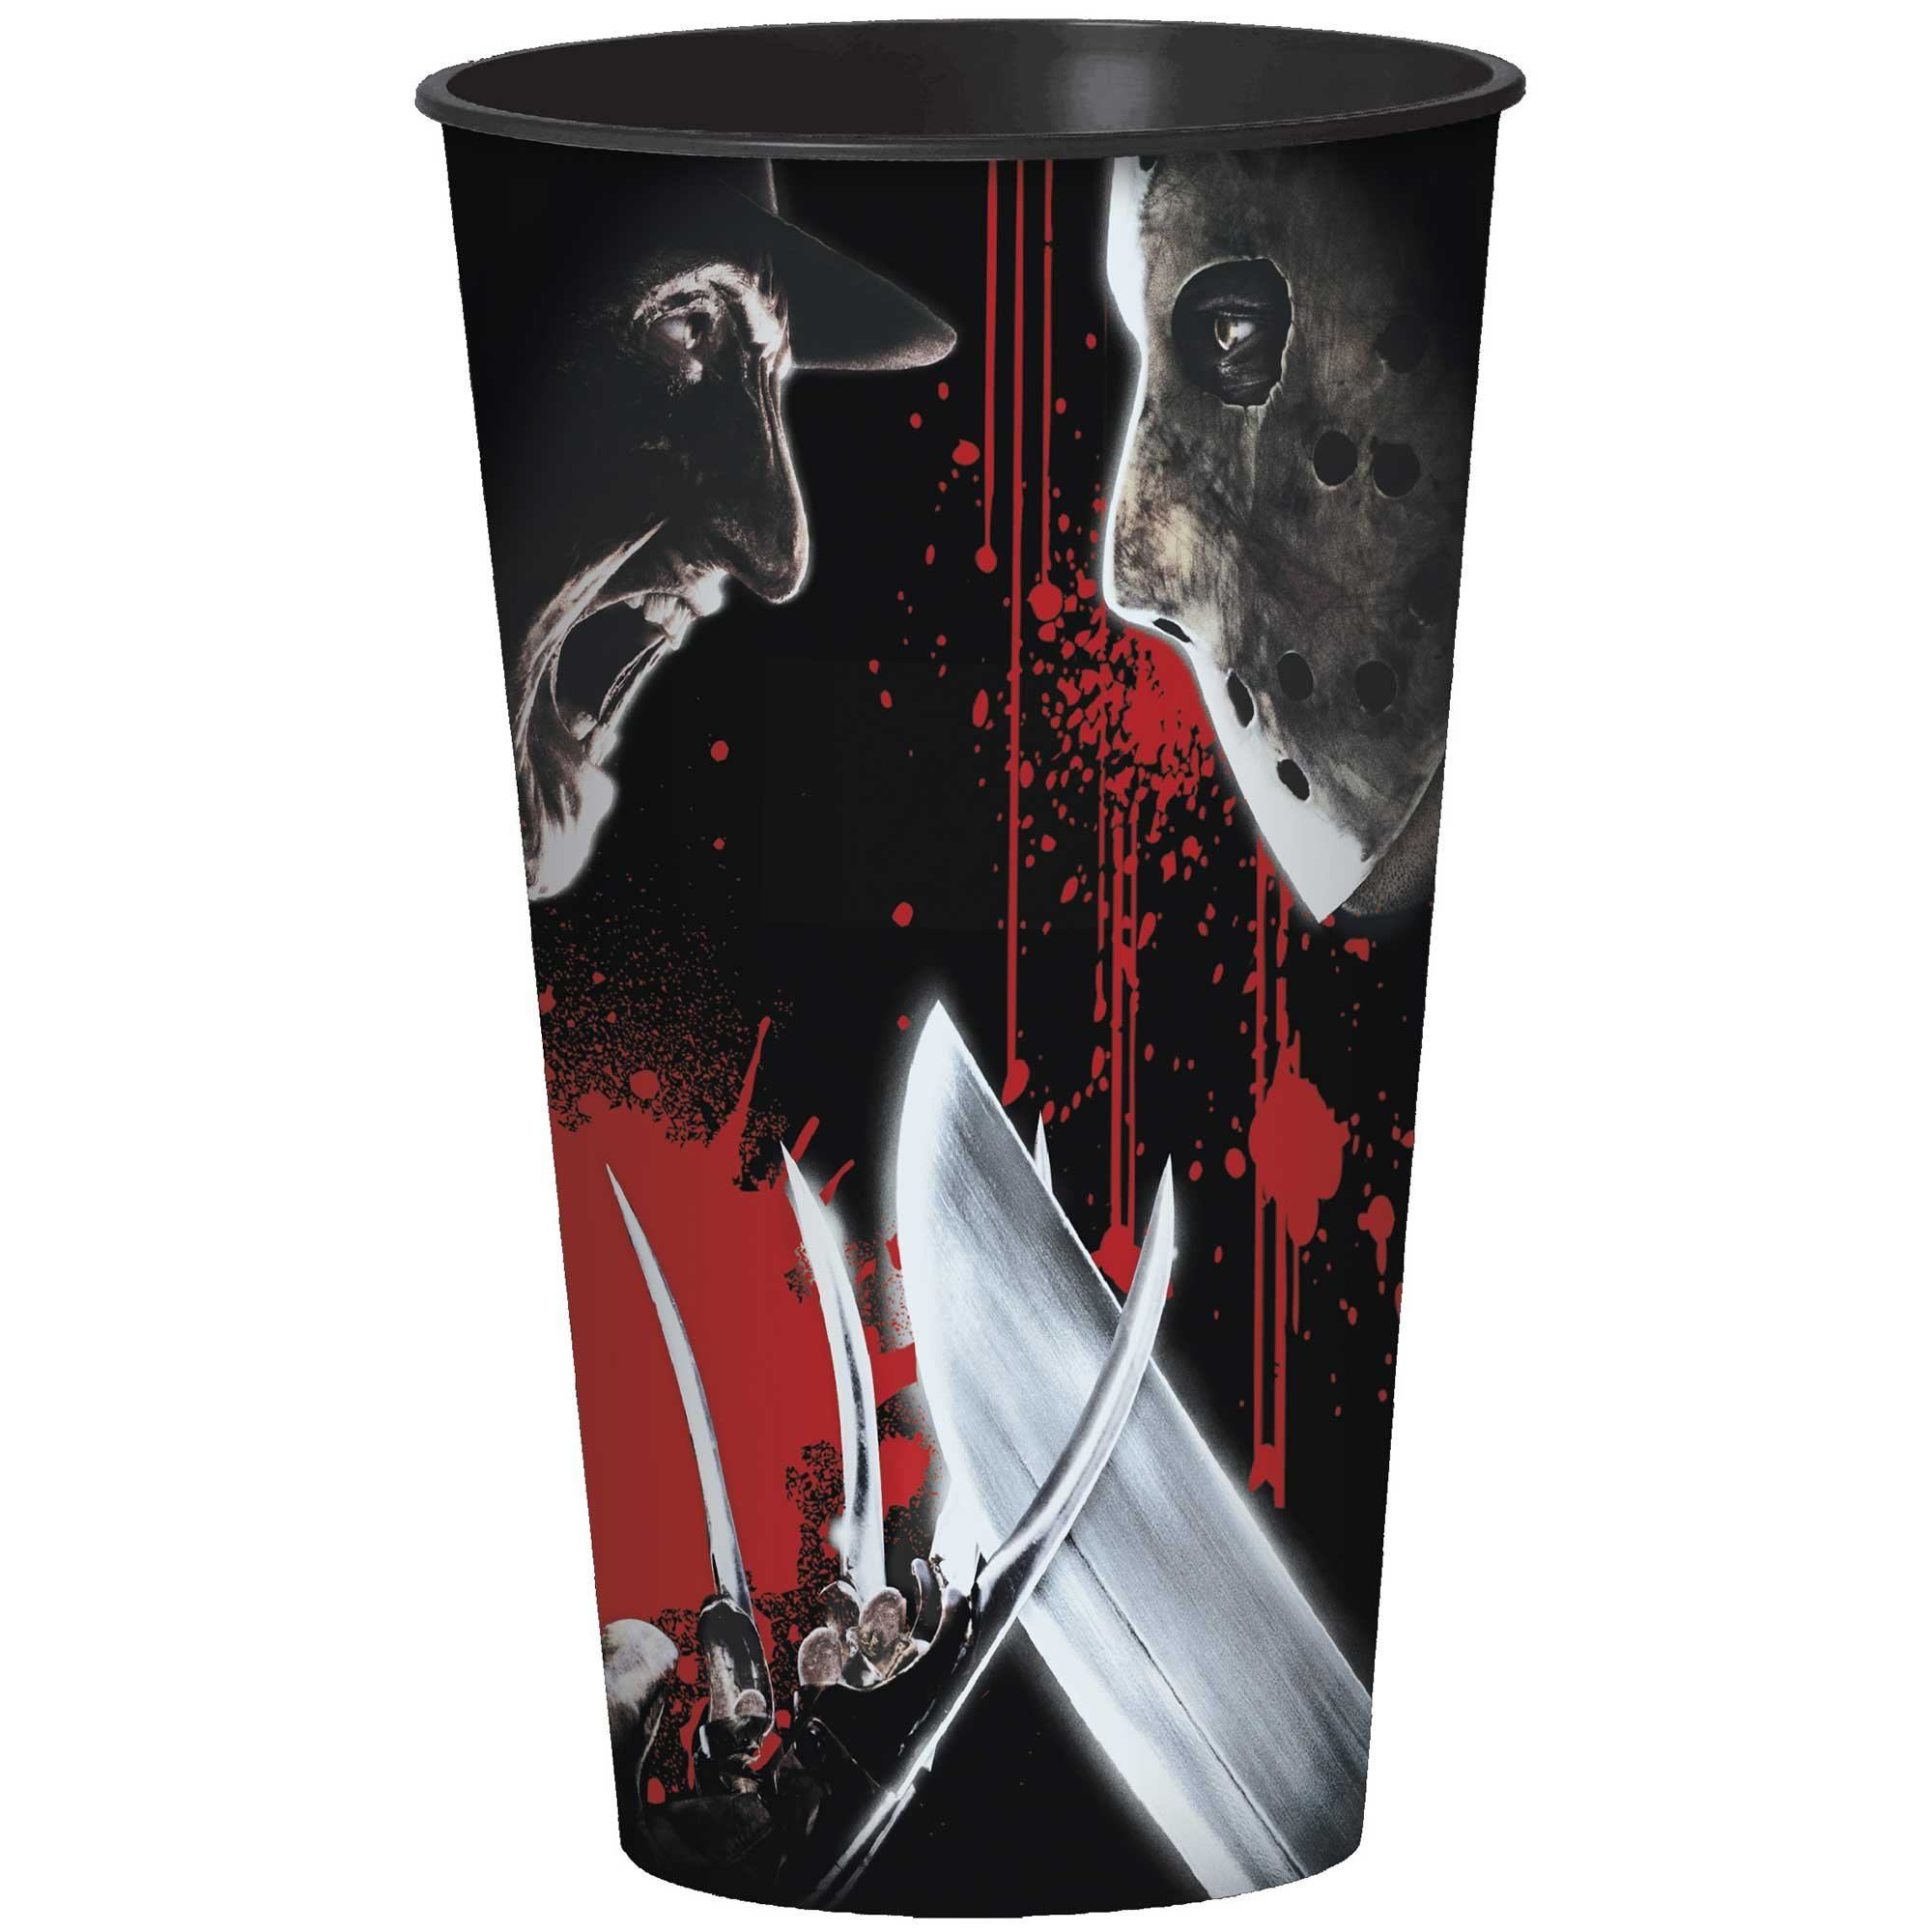 Freddy Versus Jason Plastic Cup 32oz/946ml